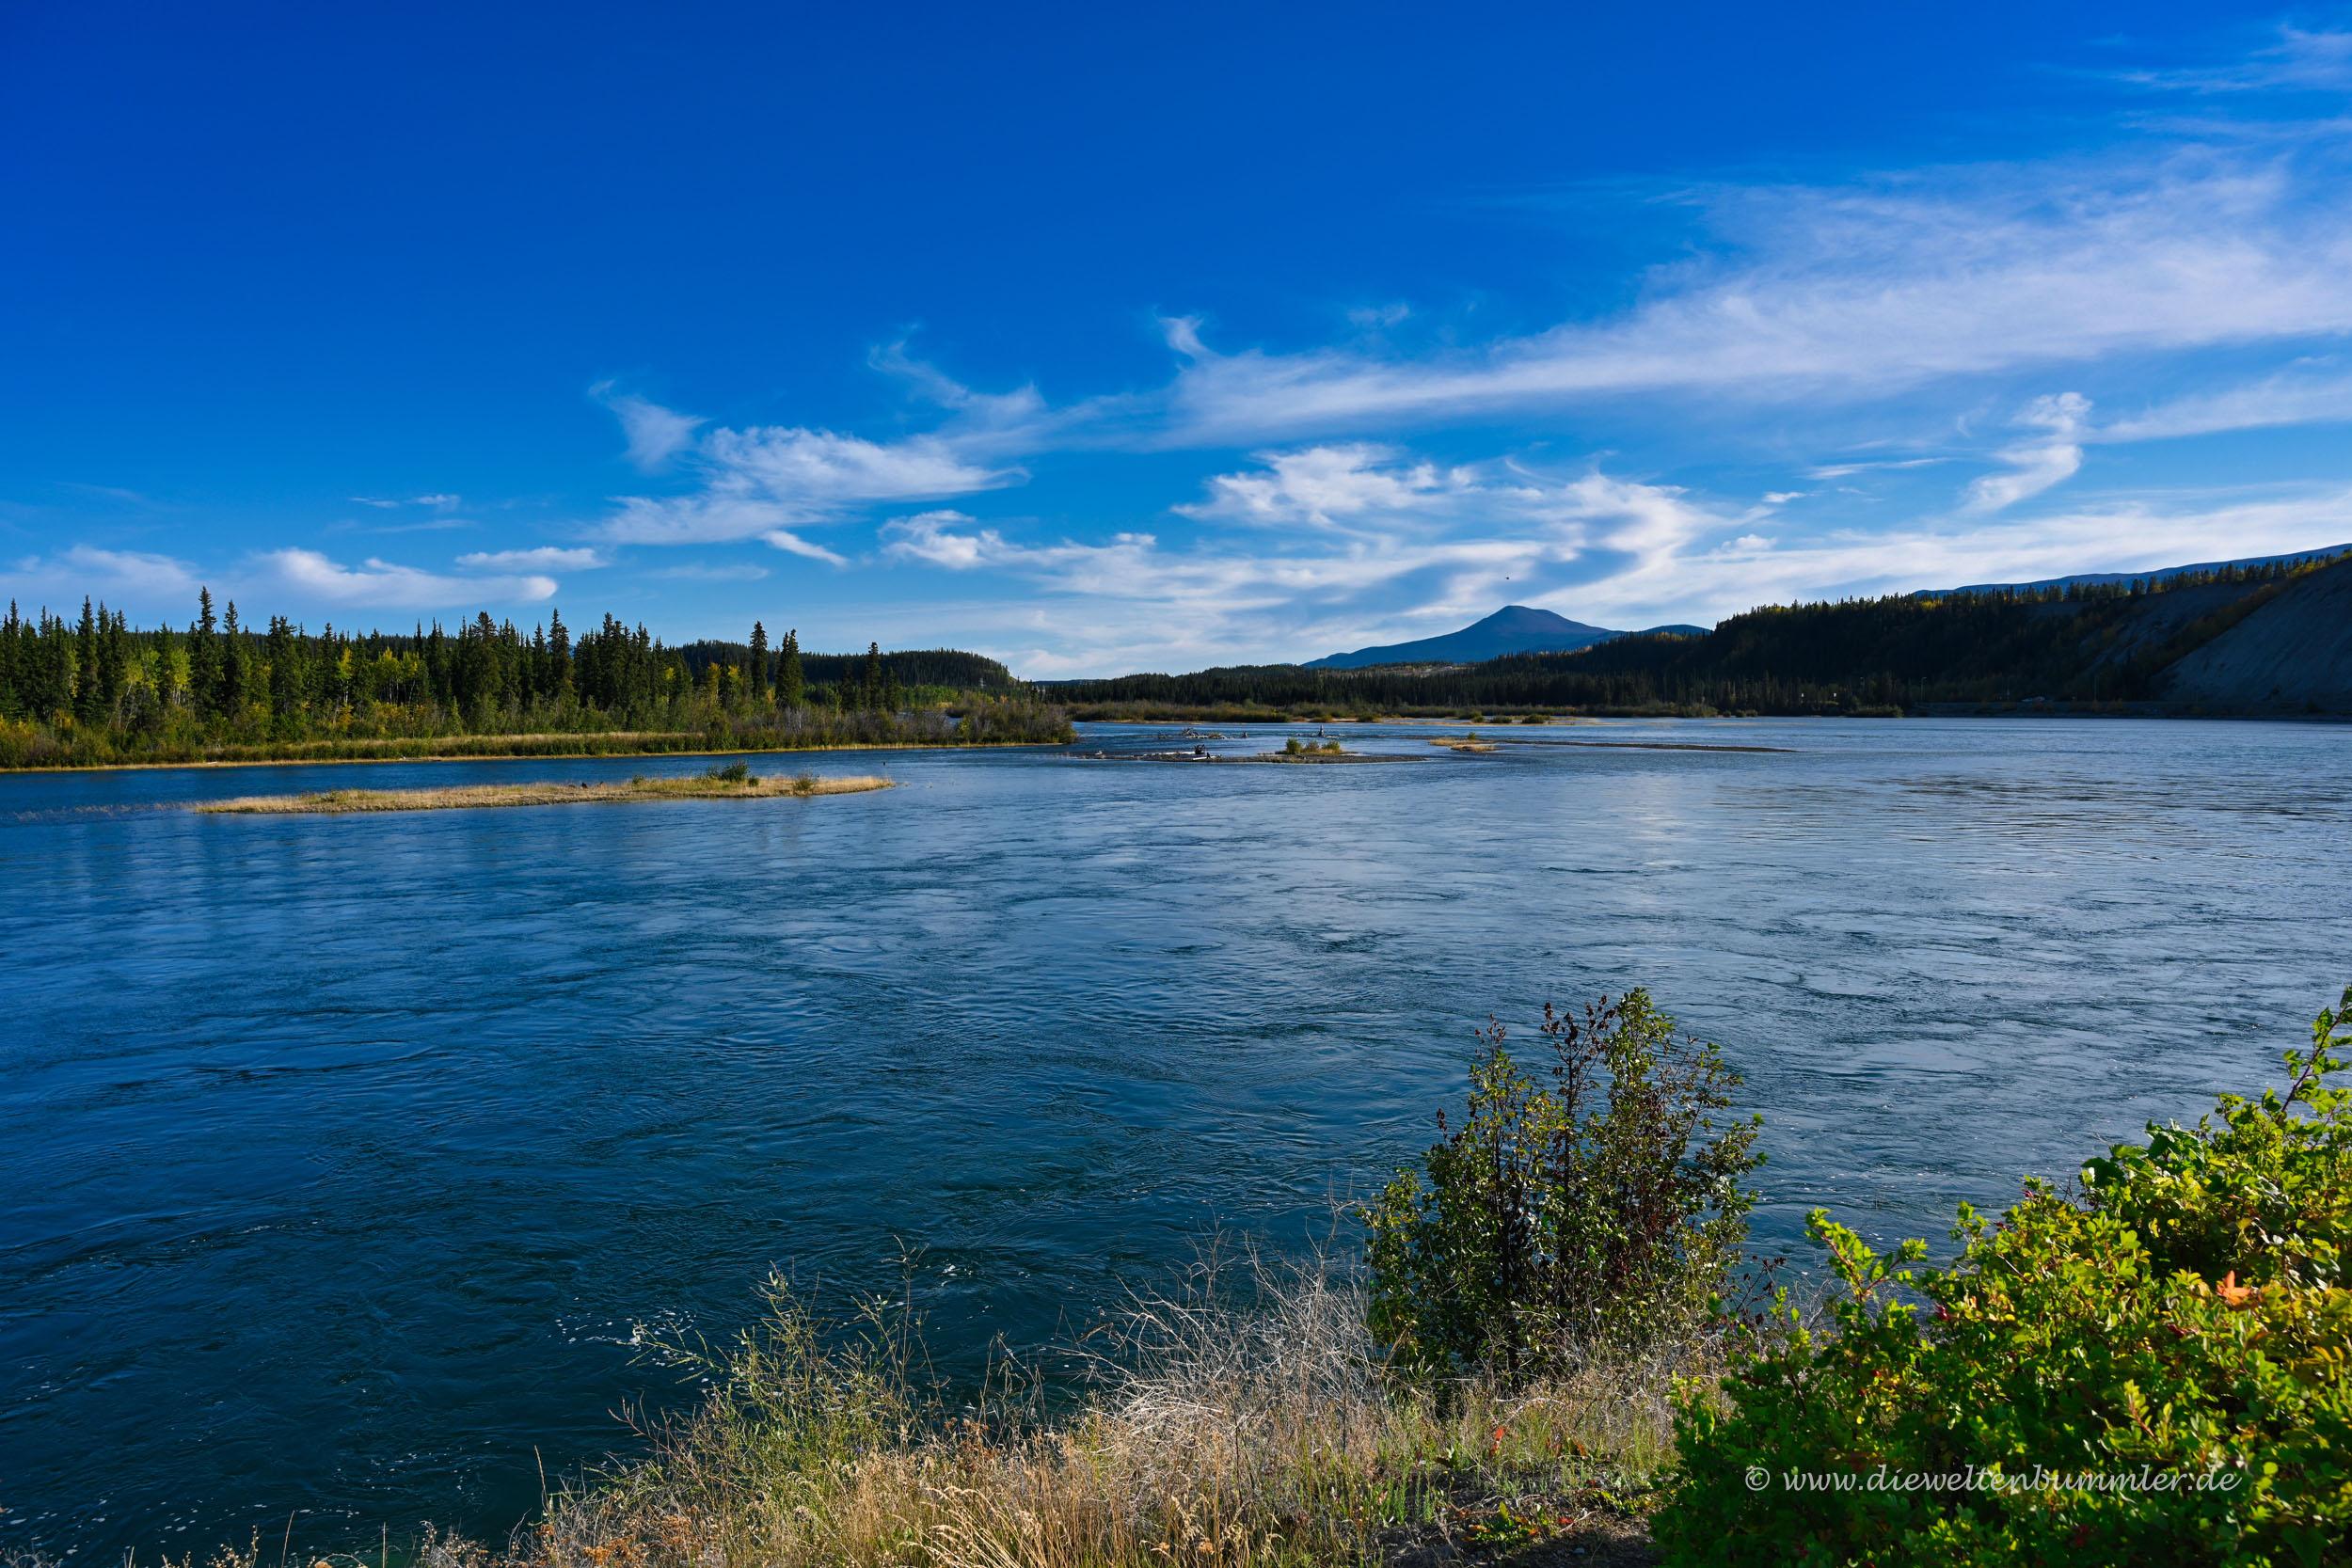 Spaziergang am Yukon